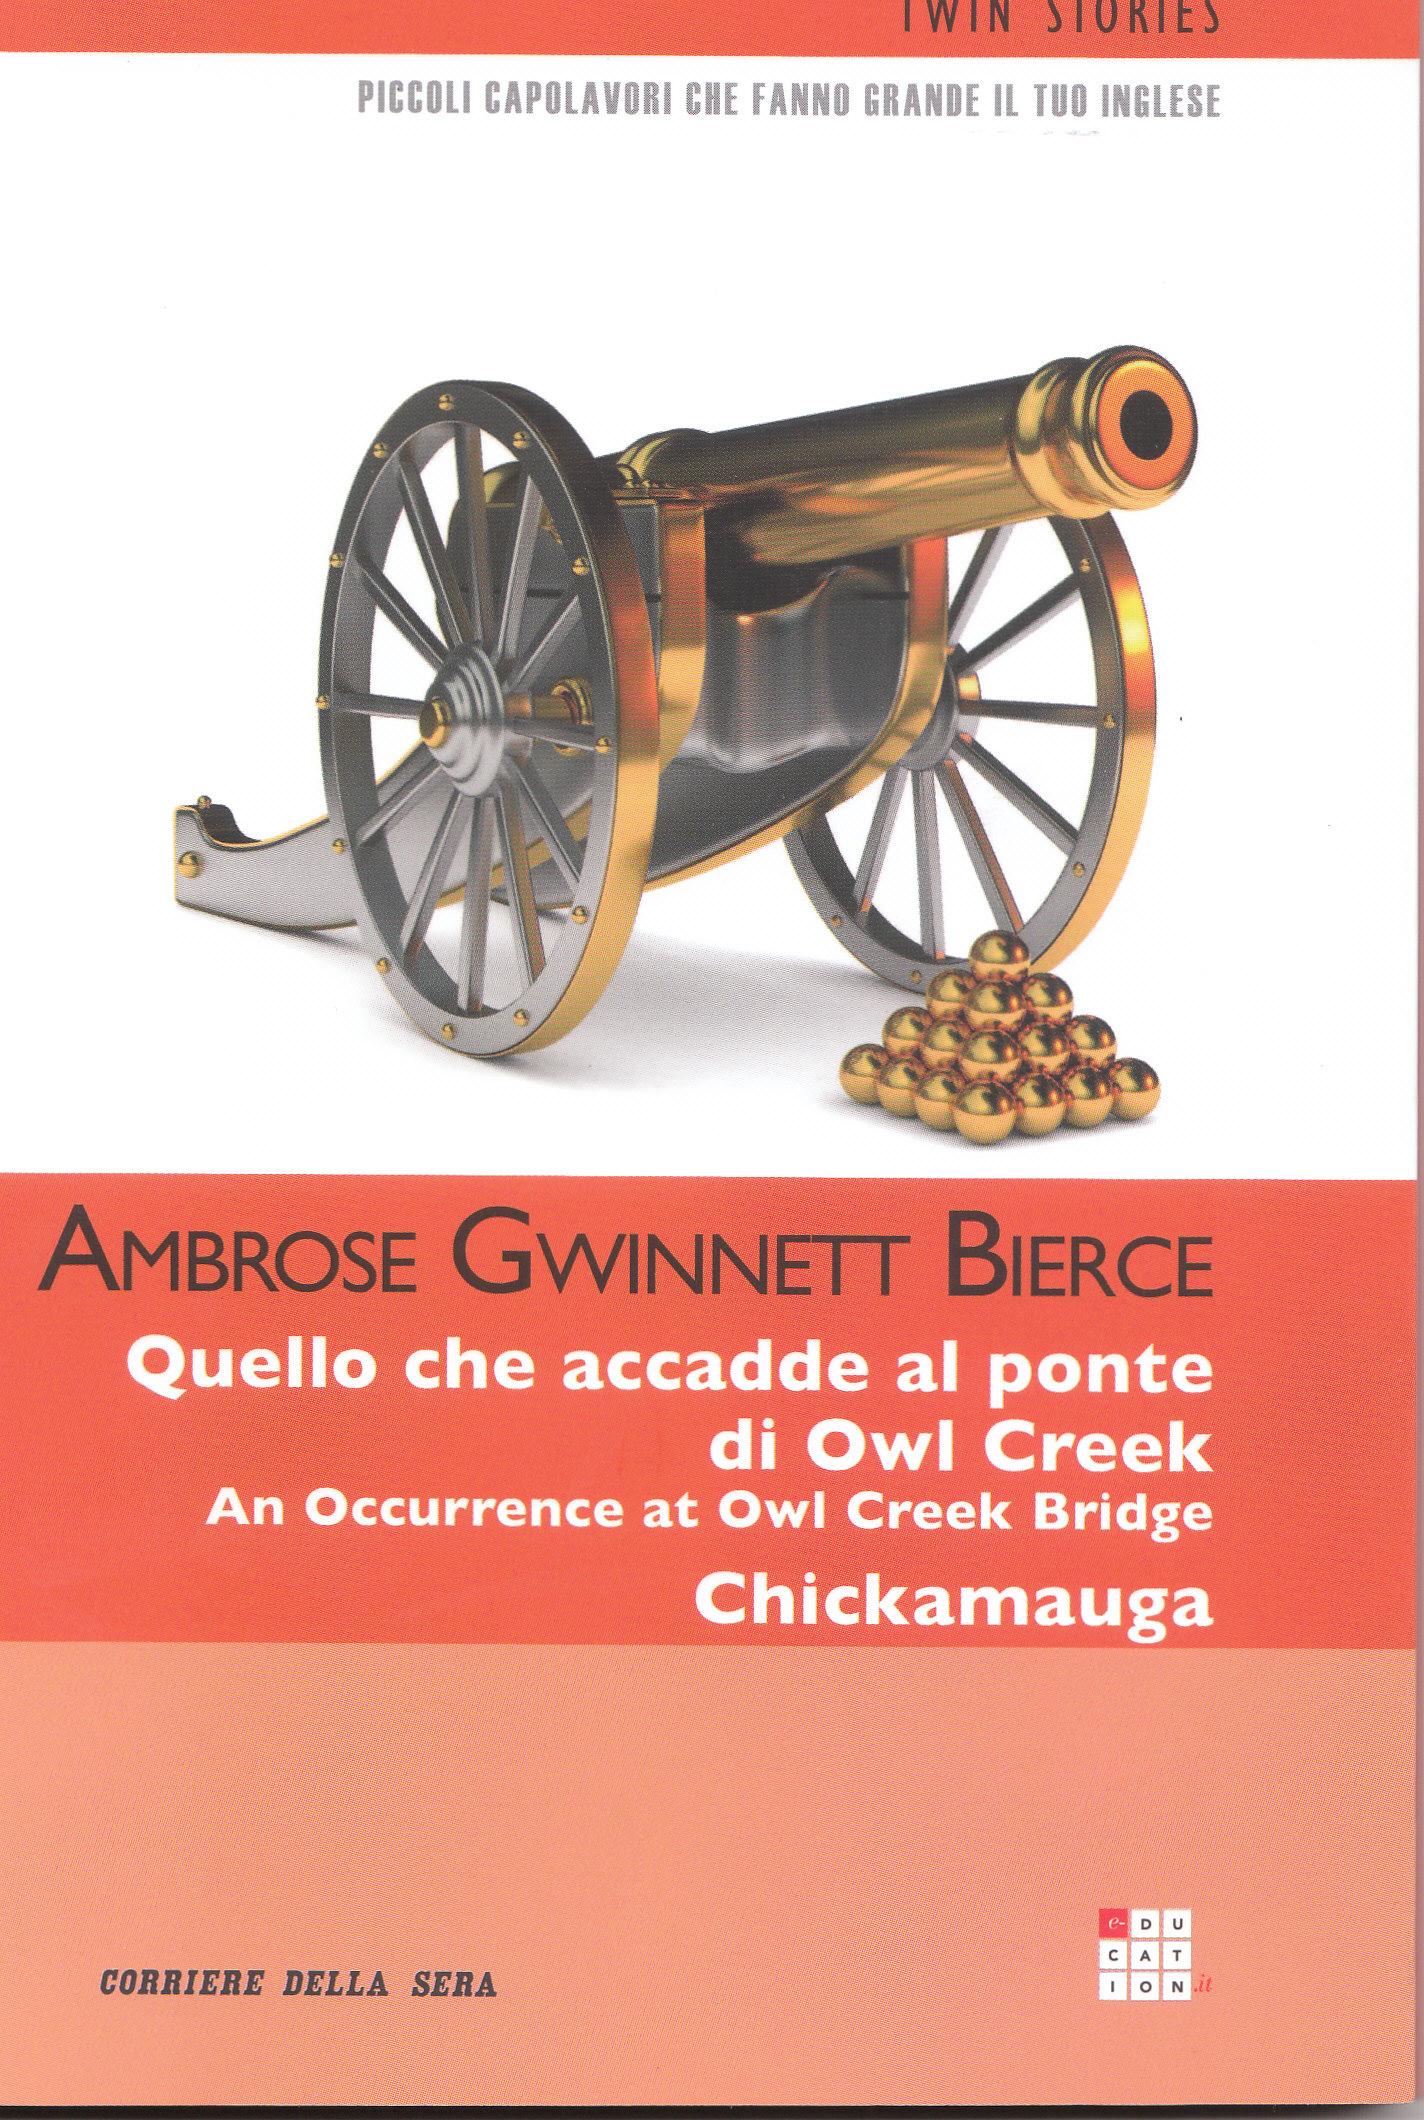 Quello che accadde al ponte di Owl Creek / An Occurrence at Owl Creek Bridge - Cickamauga